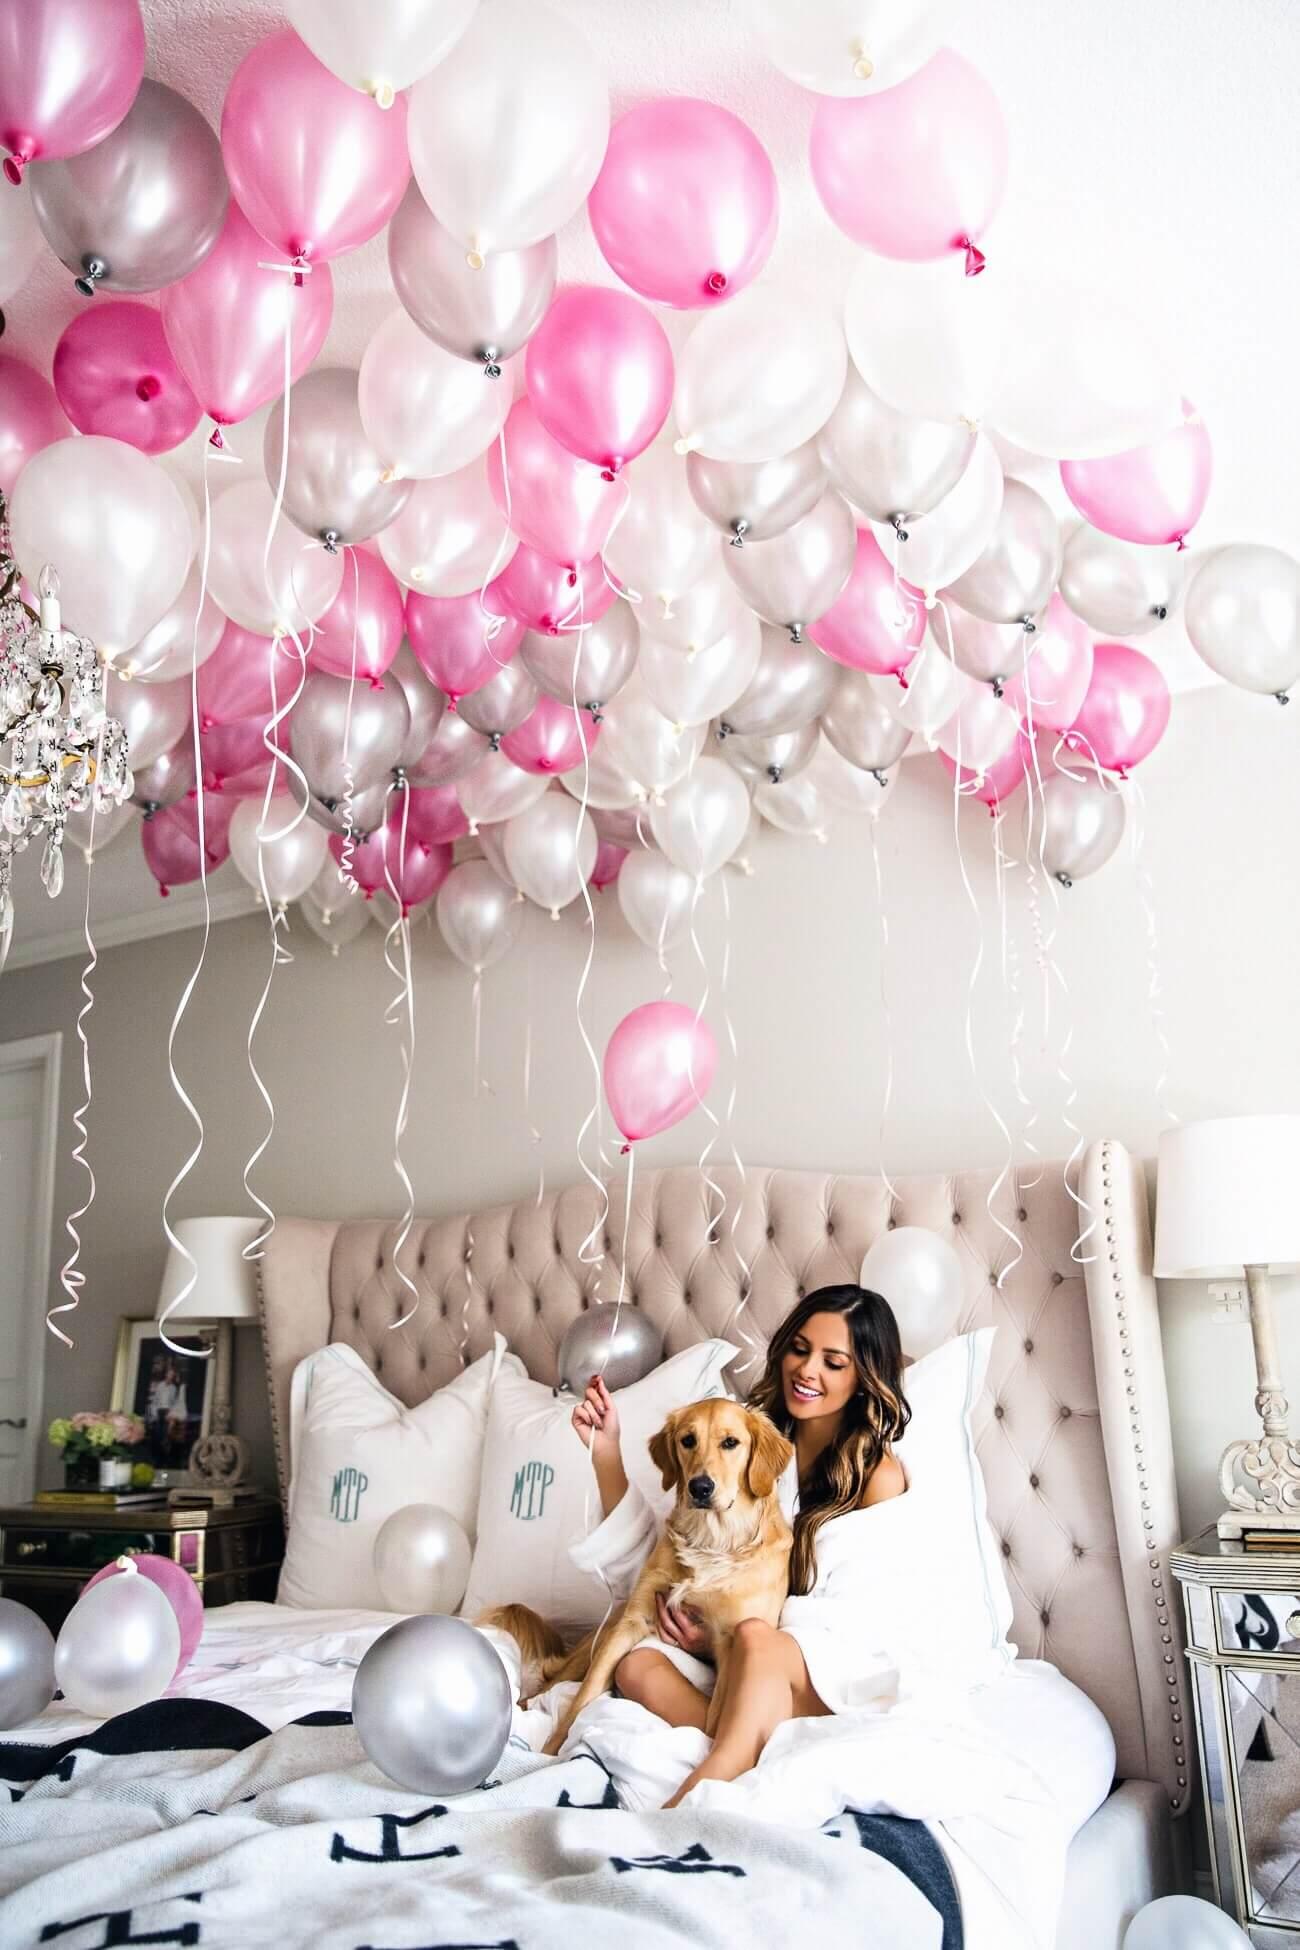 Vlog My Birthday Surprise Amp Fall Home Decor Mia Mia Mine